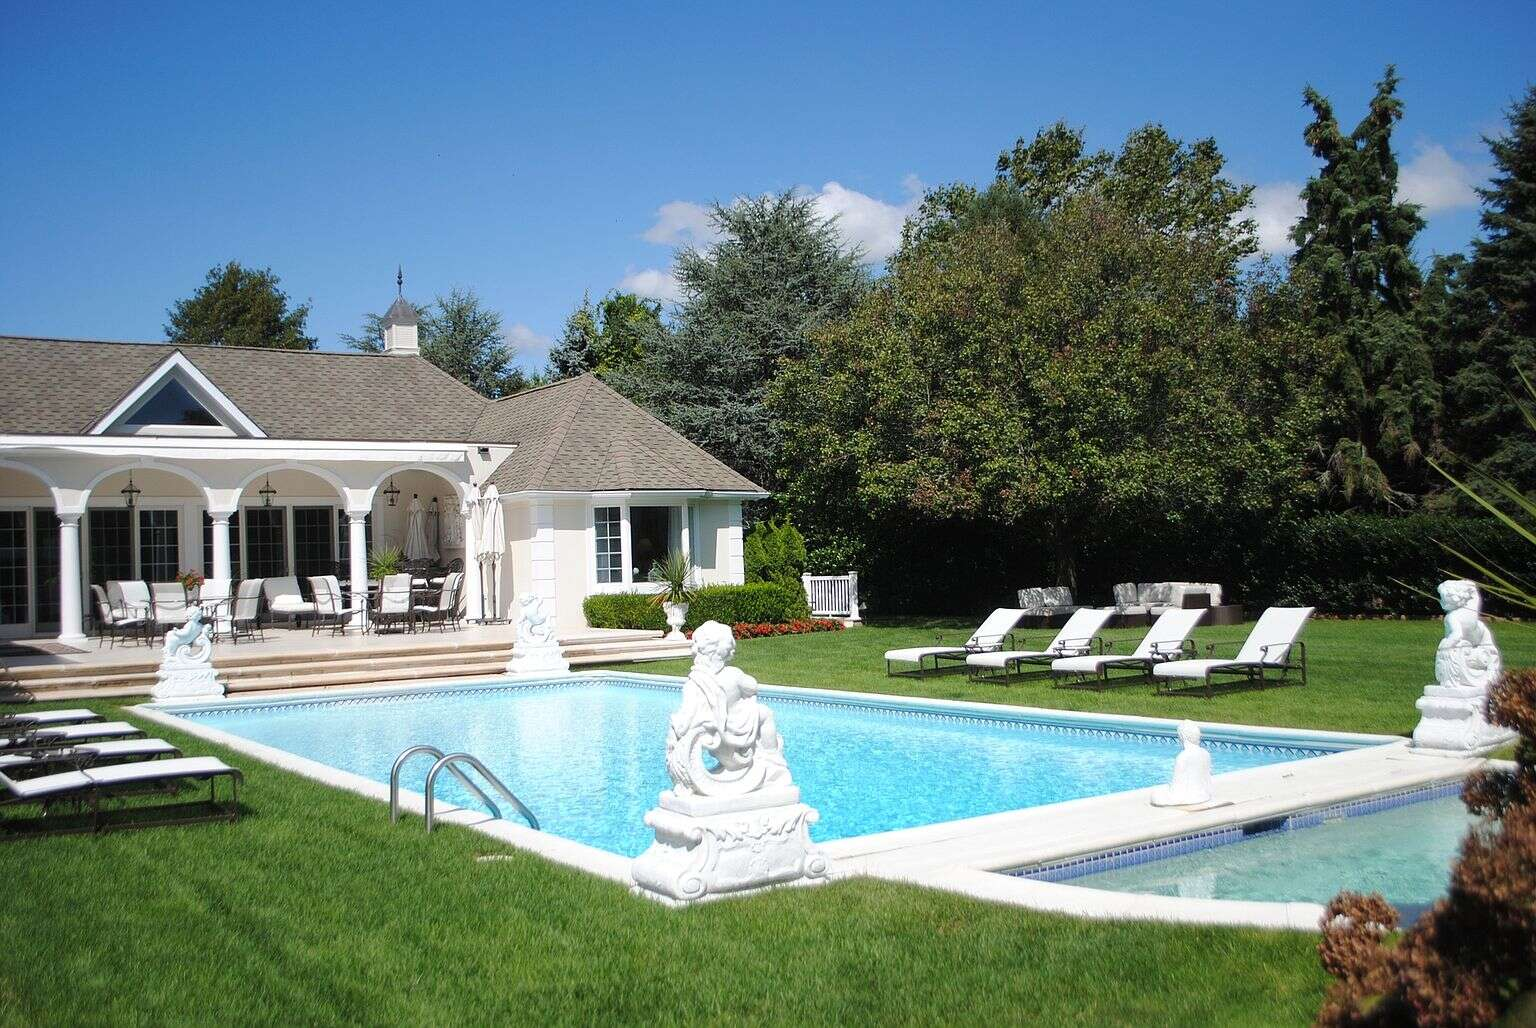 Luxury vacation rentals usa - New york - Hamptons - Southampton - Villa Halsey Farm - Image 1/17